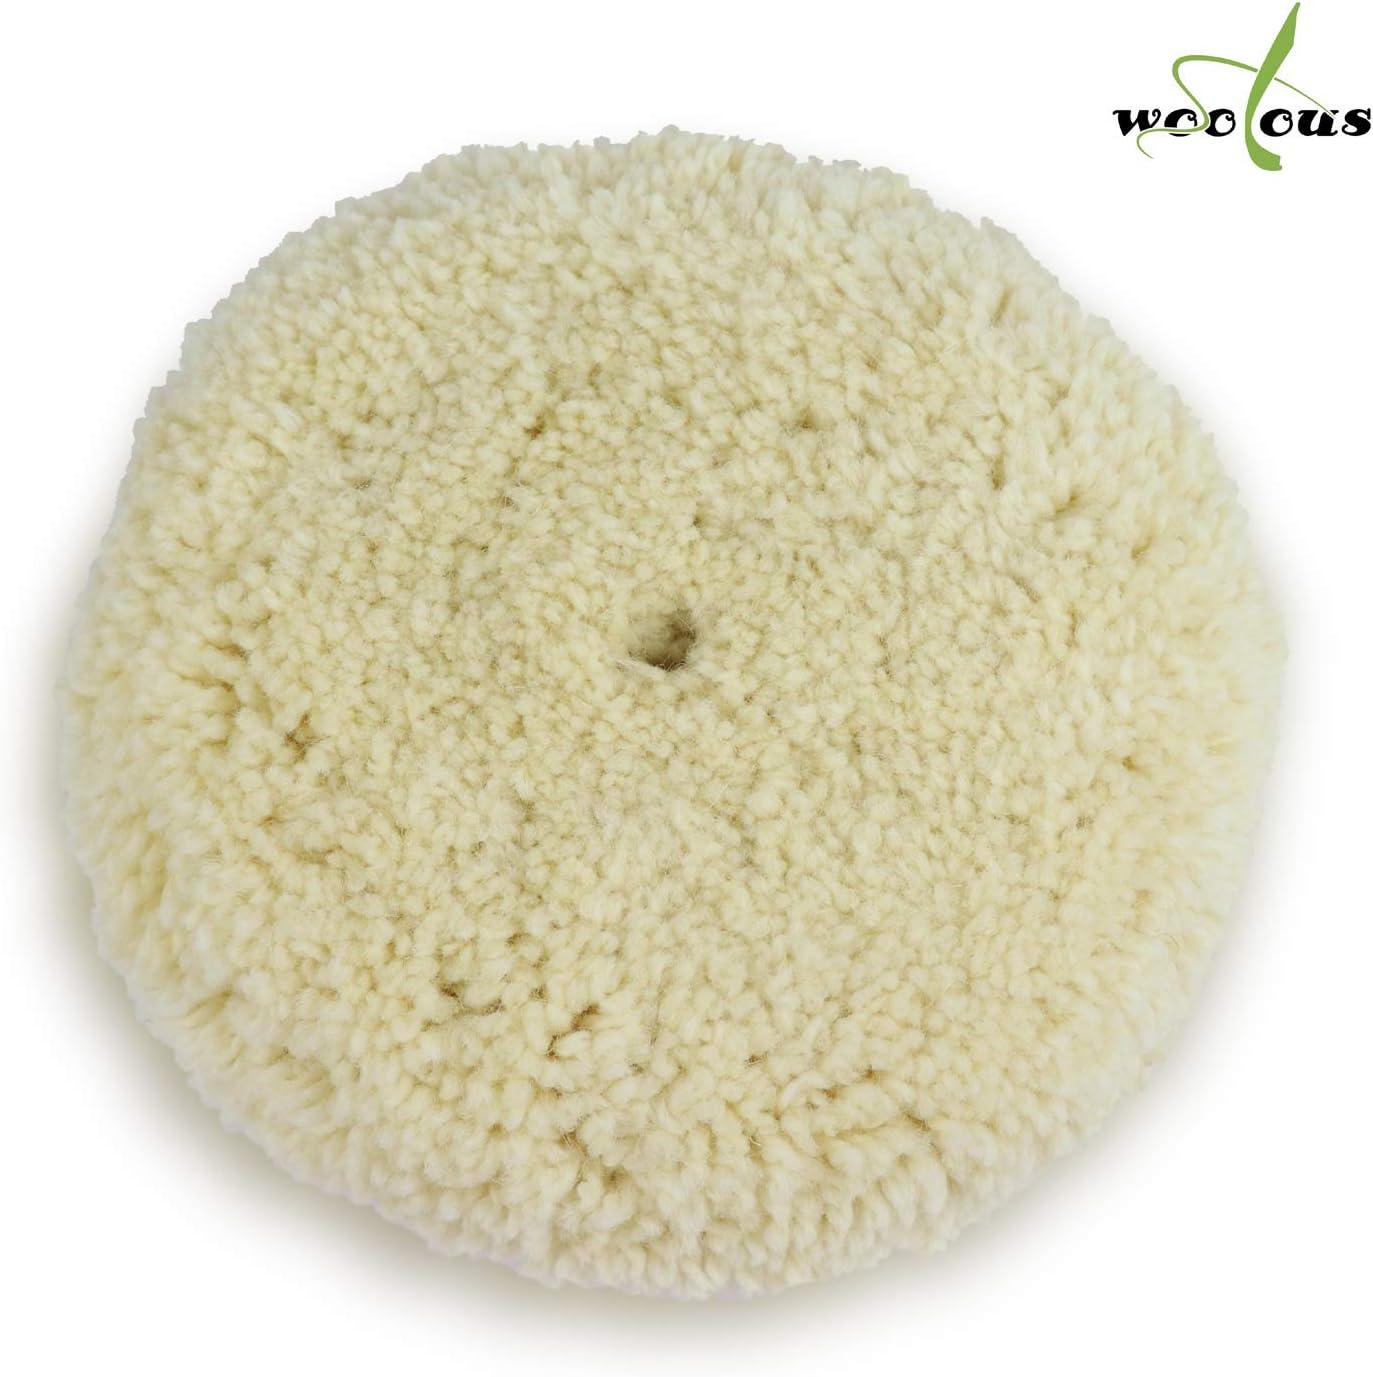 Pure Wool Compounding Pad for Car Motorcycle Washing Machine Refrigerator Furniture Cabinets Buffer Polisher Sanding,Polishing Woolous 7//180mm Polishing Buffing Pad